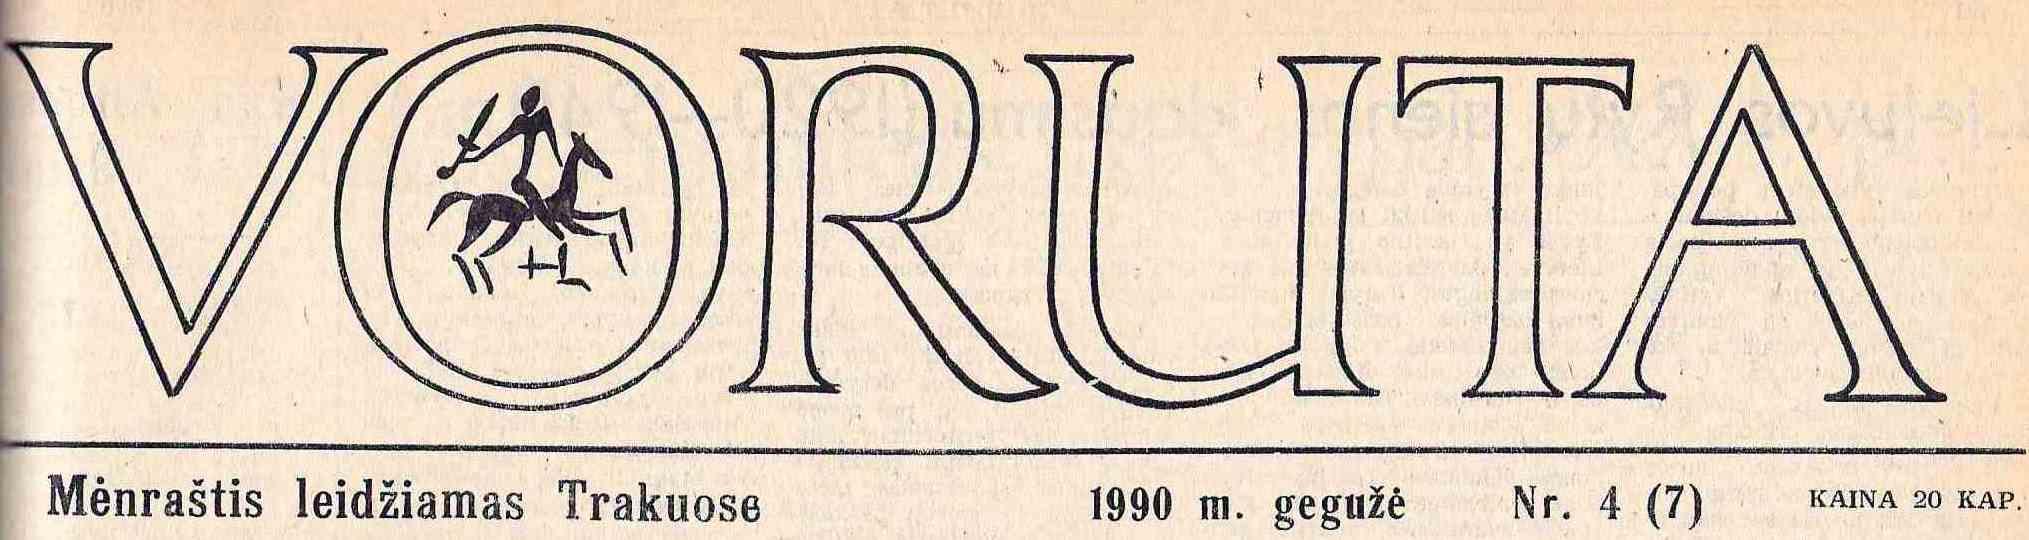 """Voruta"" antraštė su paminėta mėnraščio leidimo vieta – Trakai   Voruta.lt nuotr."